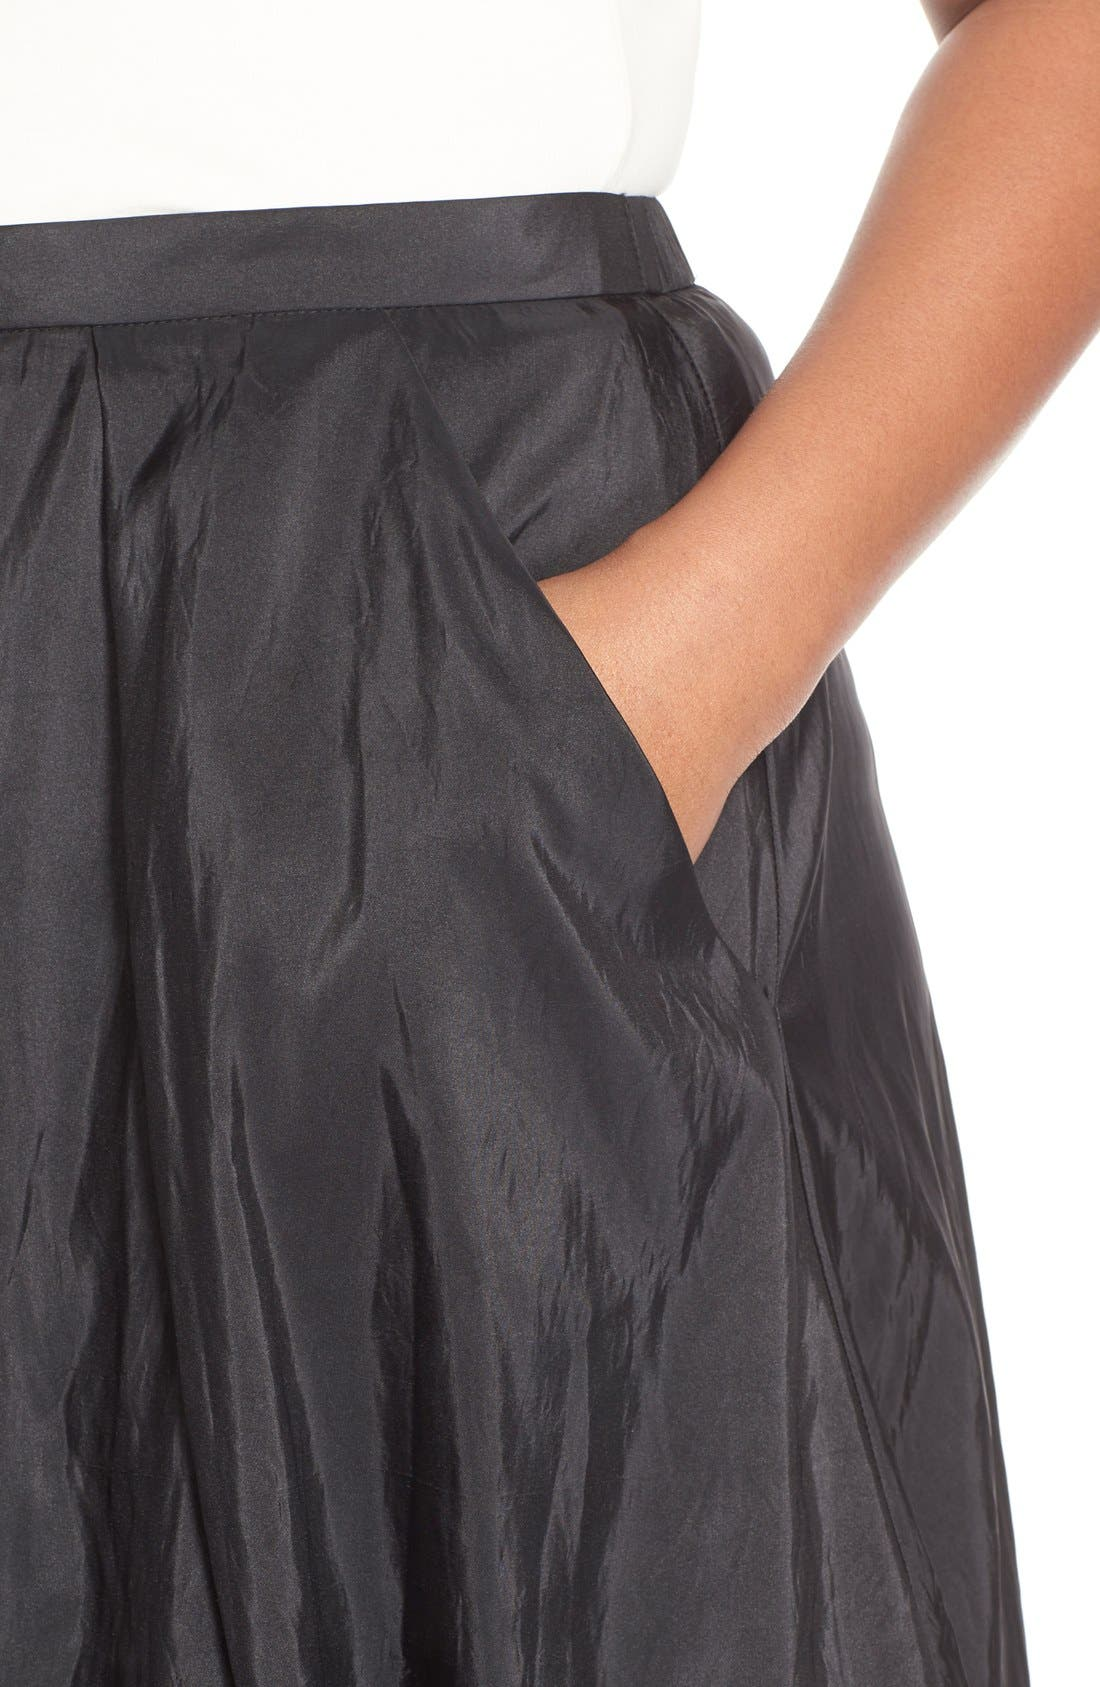 Taffeta Ballgown Skirt,                             Alternate thumbnail 4, color,                             BLACK